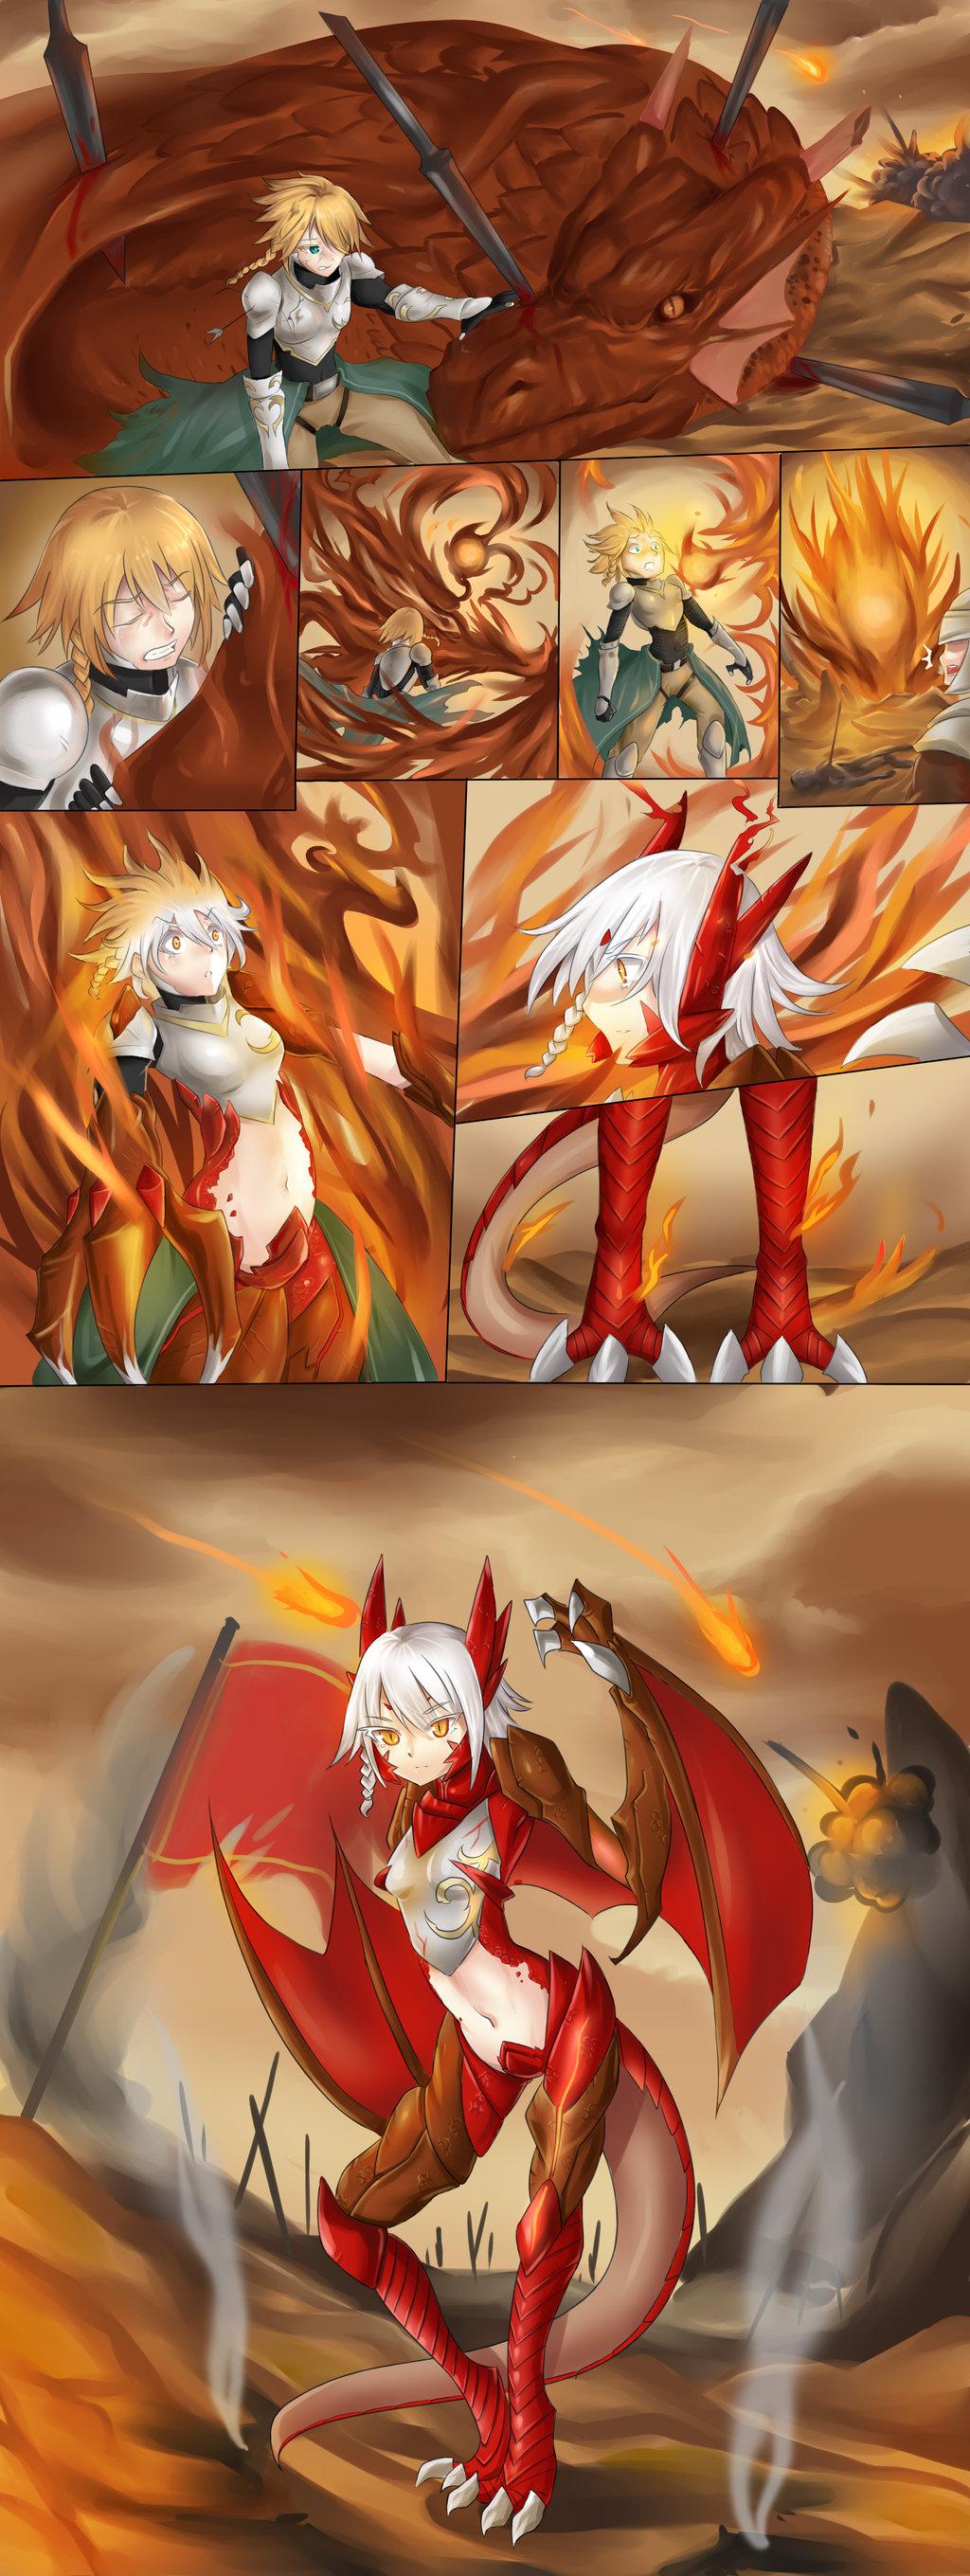 Dragon masterbating female nude video